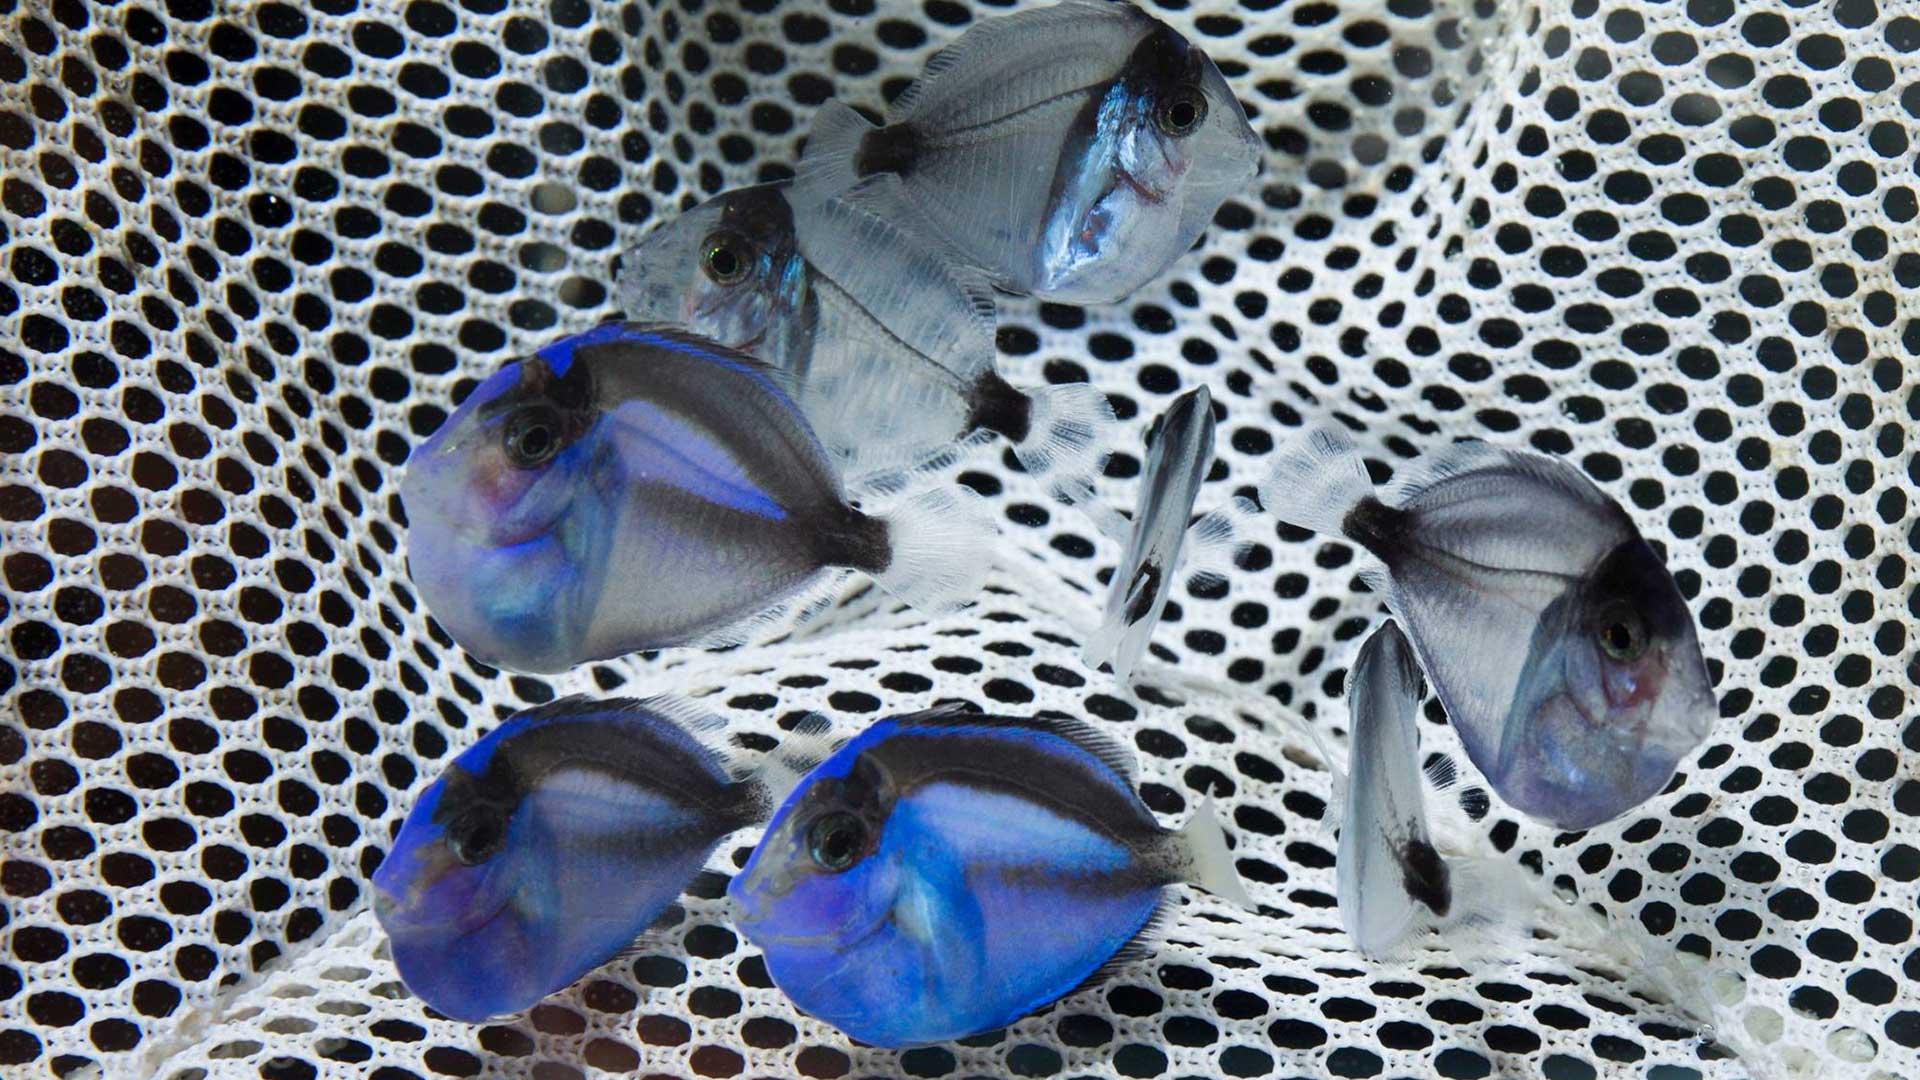 bluetang fry